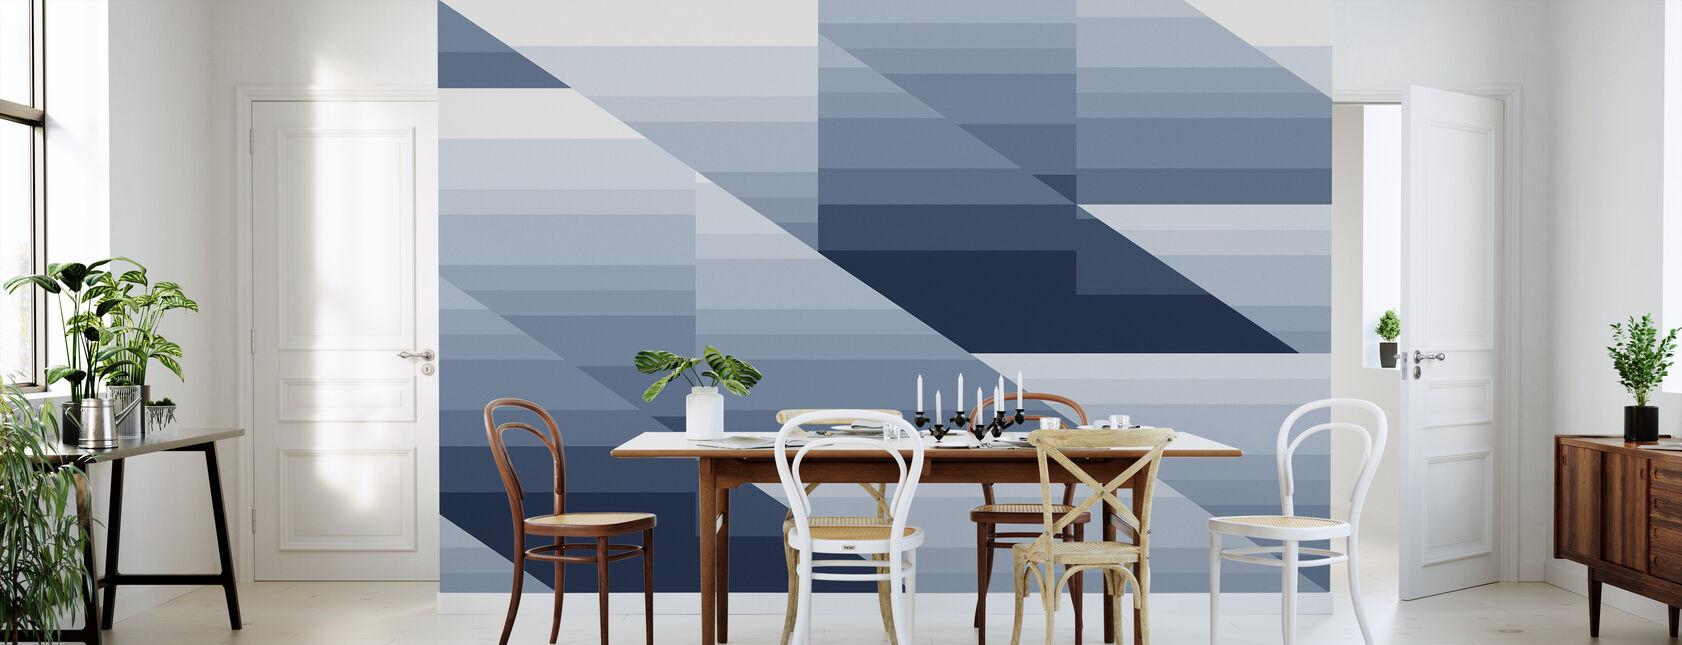 Arctica Blue - Wallpaper - Kitchen